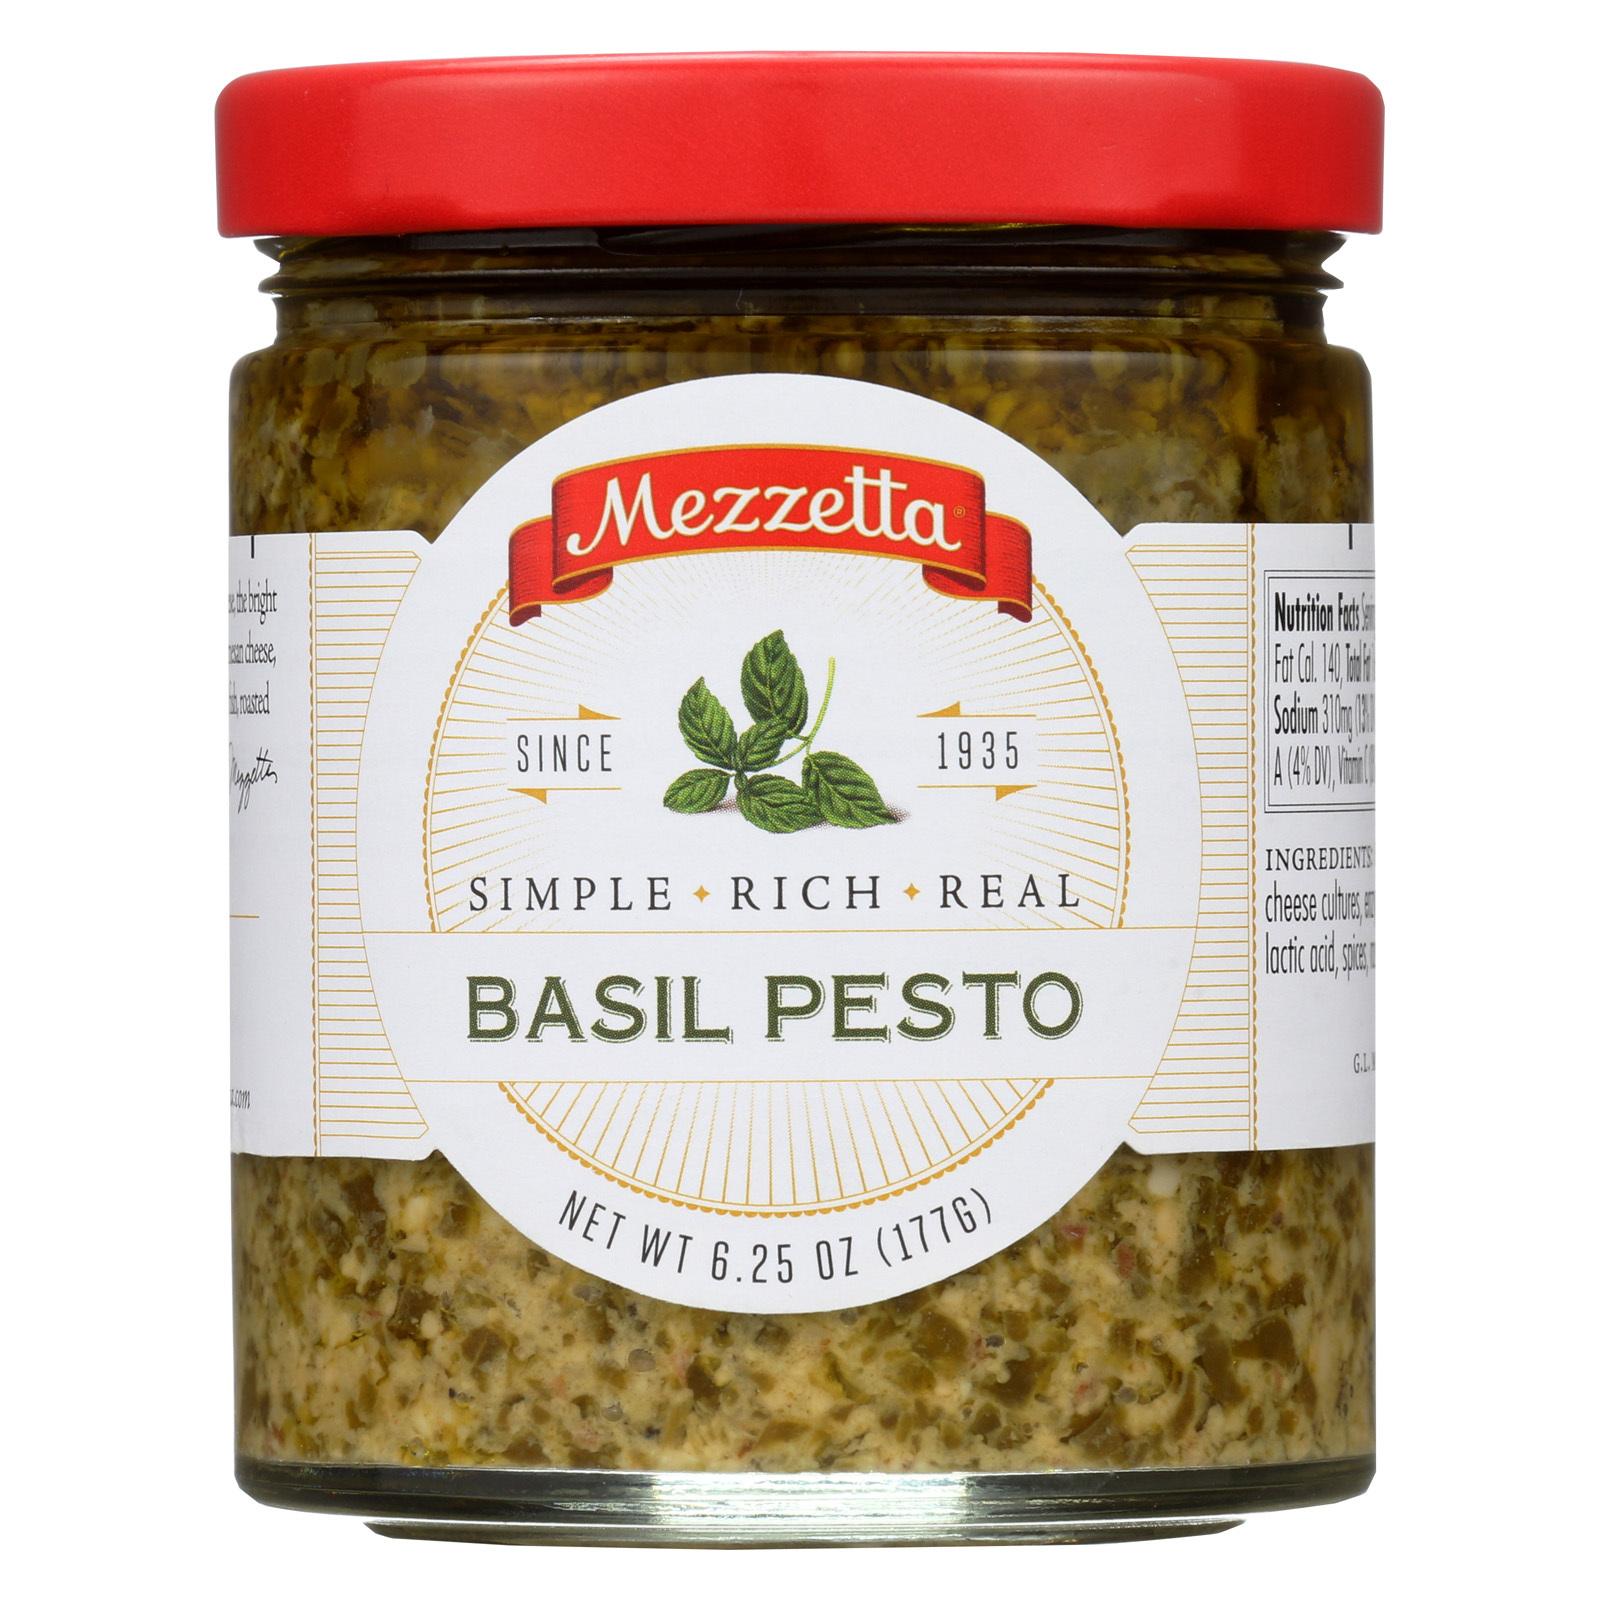 Mezzetta Sauce - Basil Pesto - Case of 6 - 6.25 Fl oz.